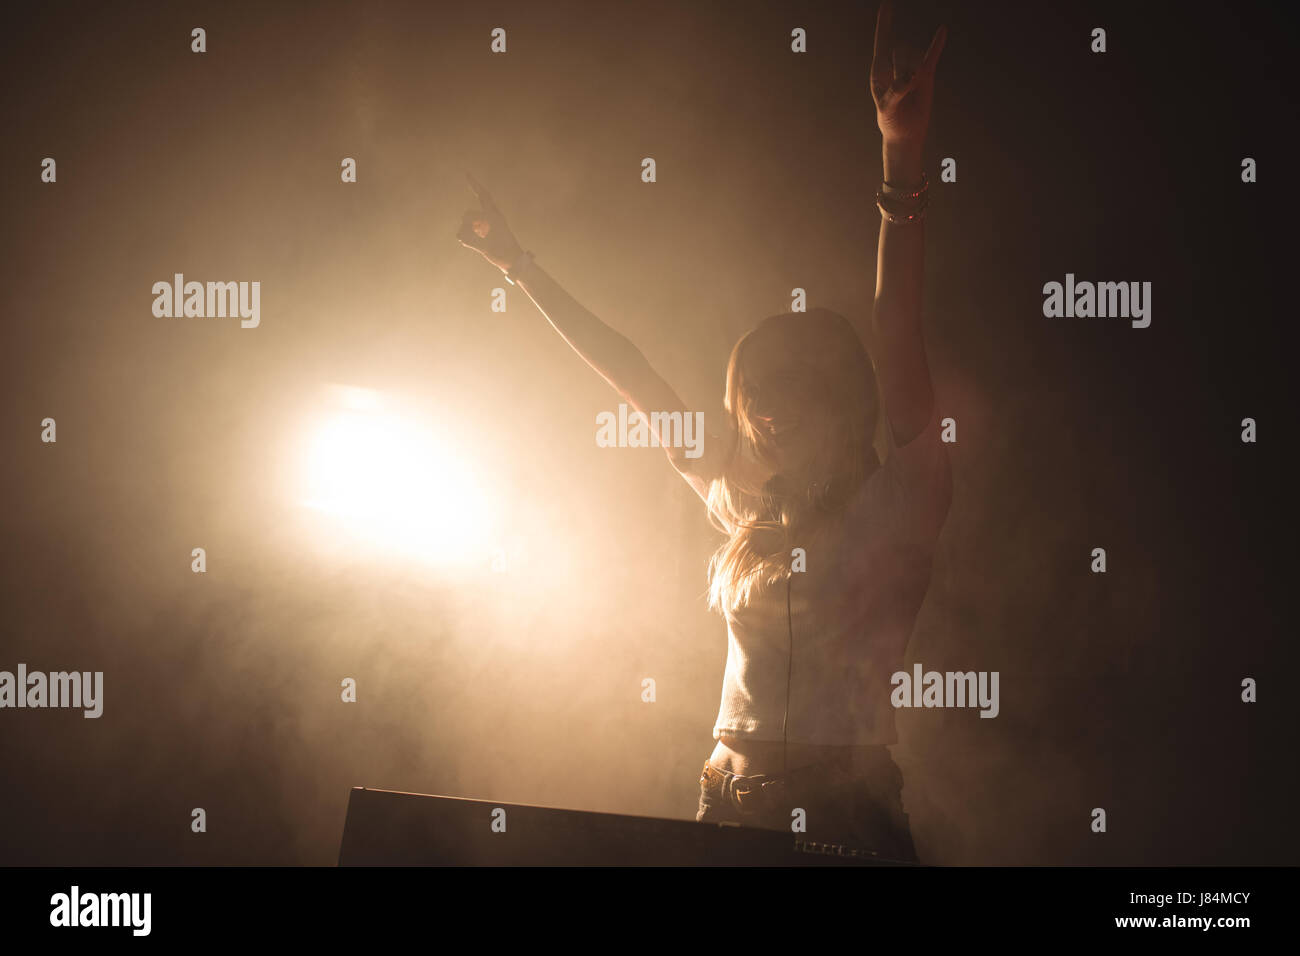 Enthusiastic female DJ playing music in illuminated nightclub - Stock Image